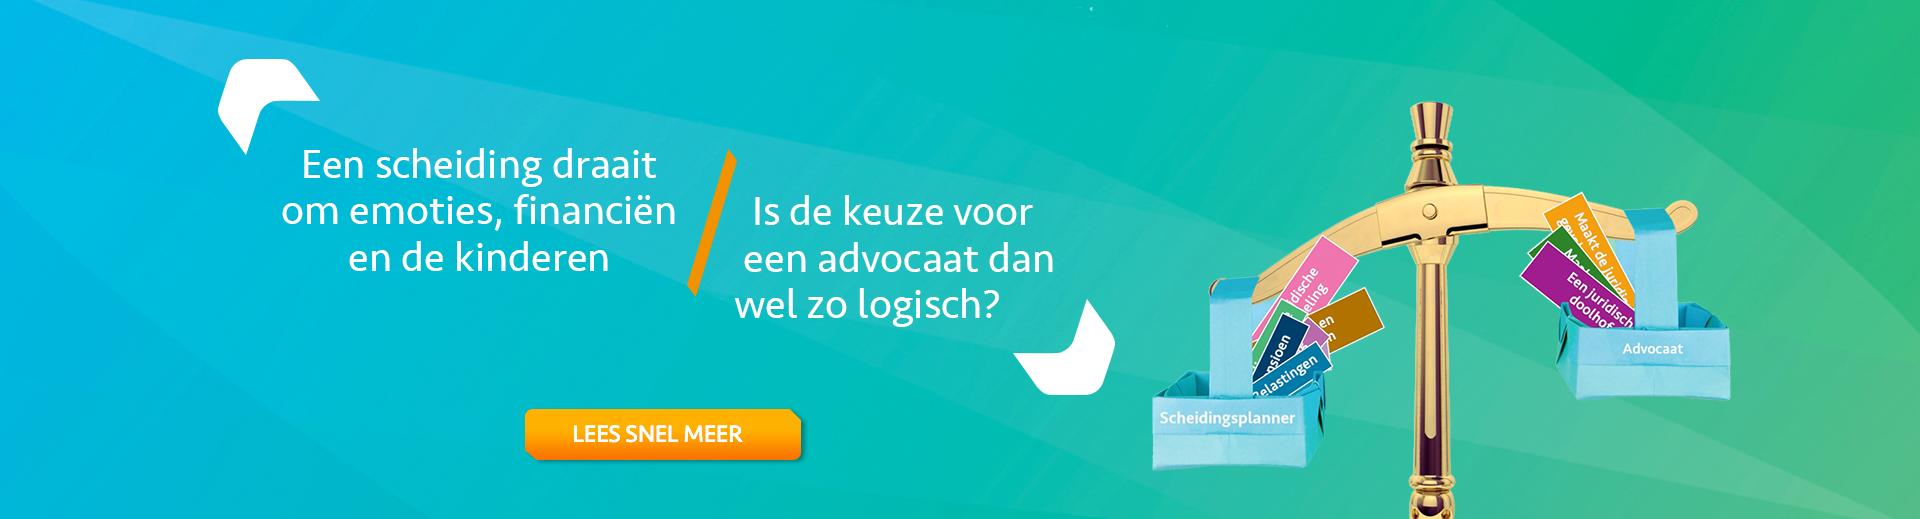 scheiden zonder advocaat - Scheidingsplanner Maastricht - Heerlen - Gulpen